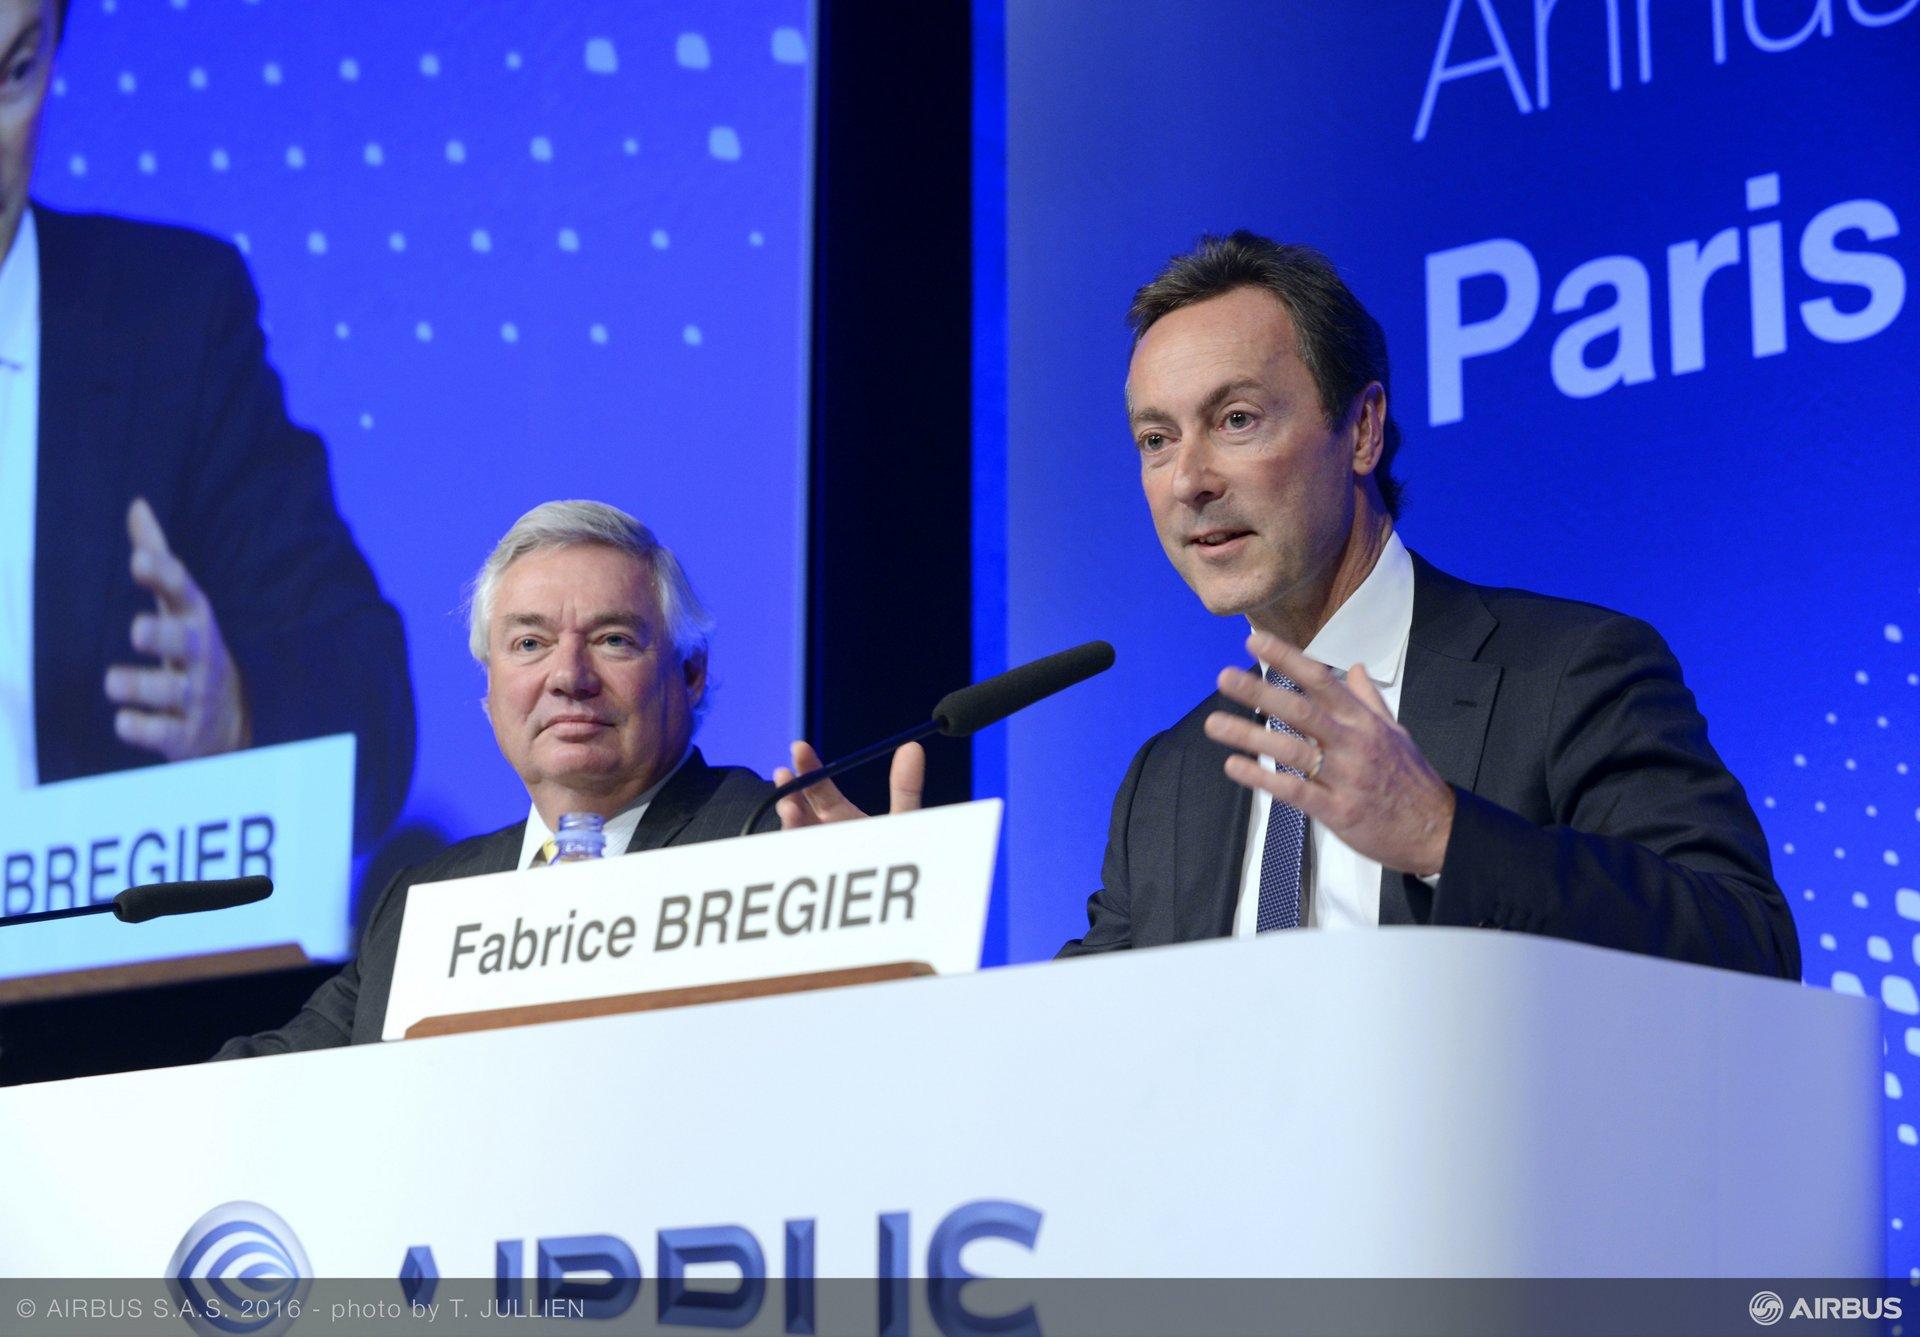 2016 Airbus annual press conference 2